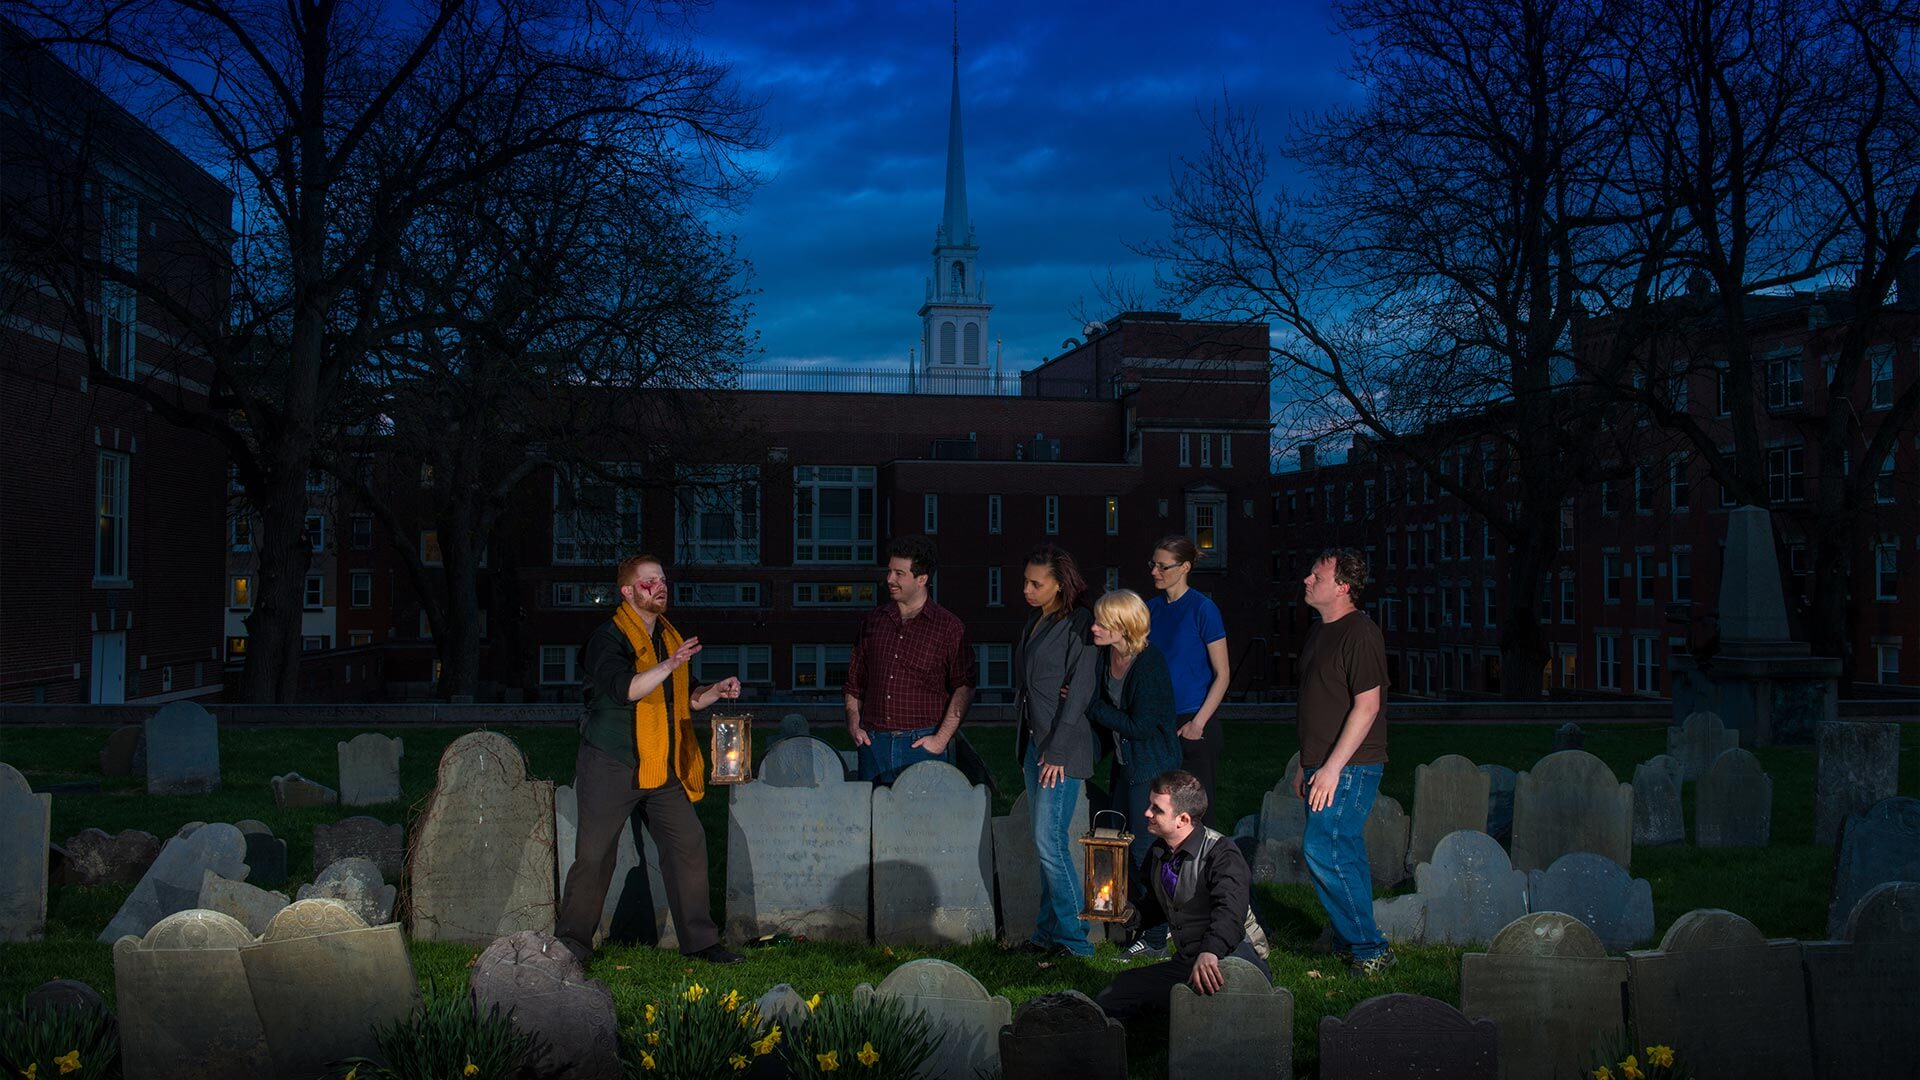 Ghosts & Gravestones Tour at night in Boston